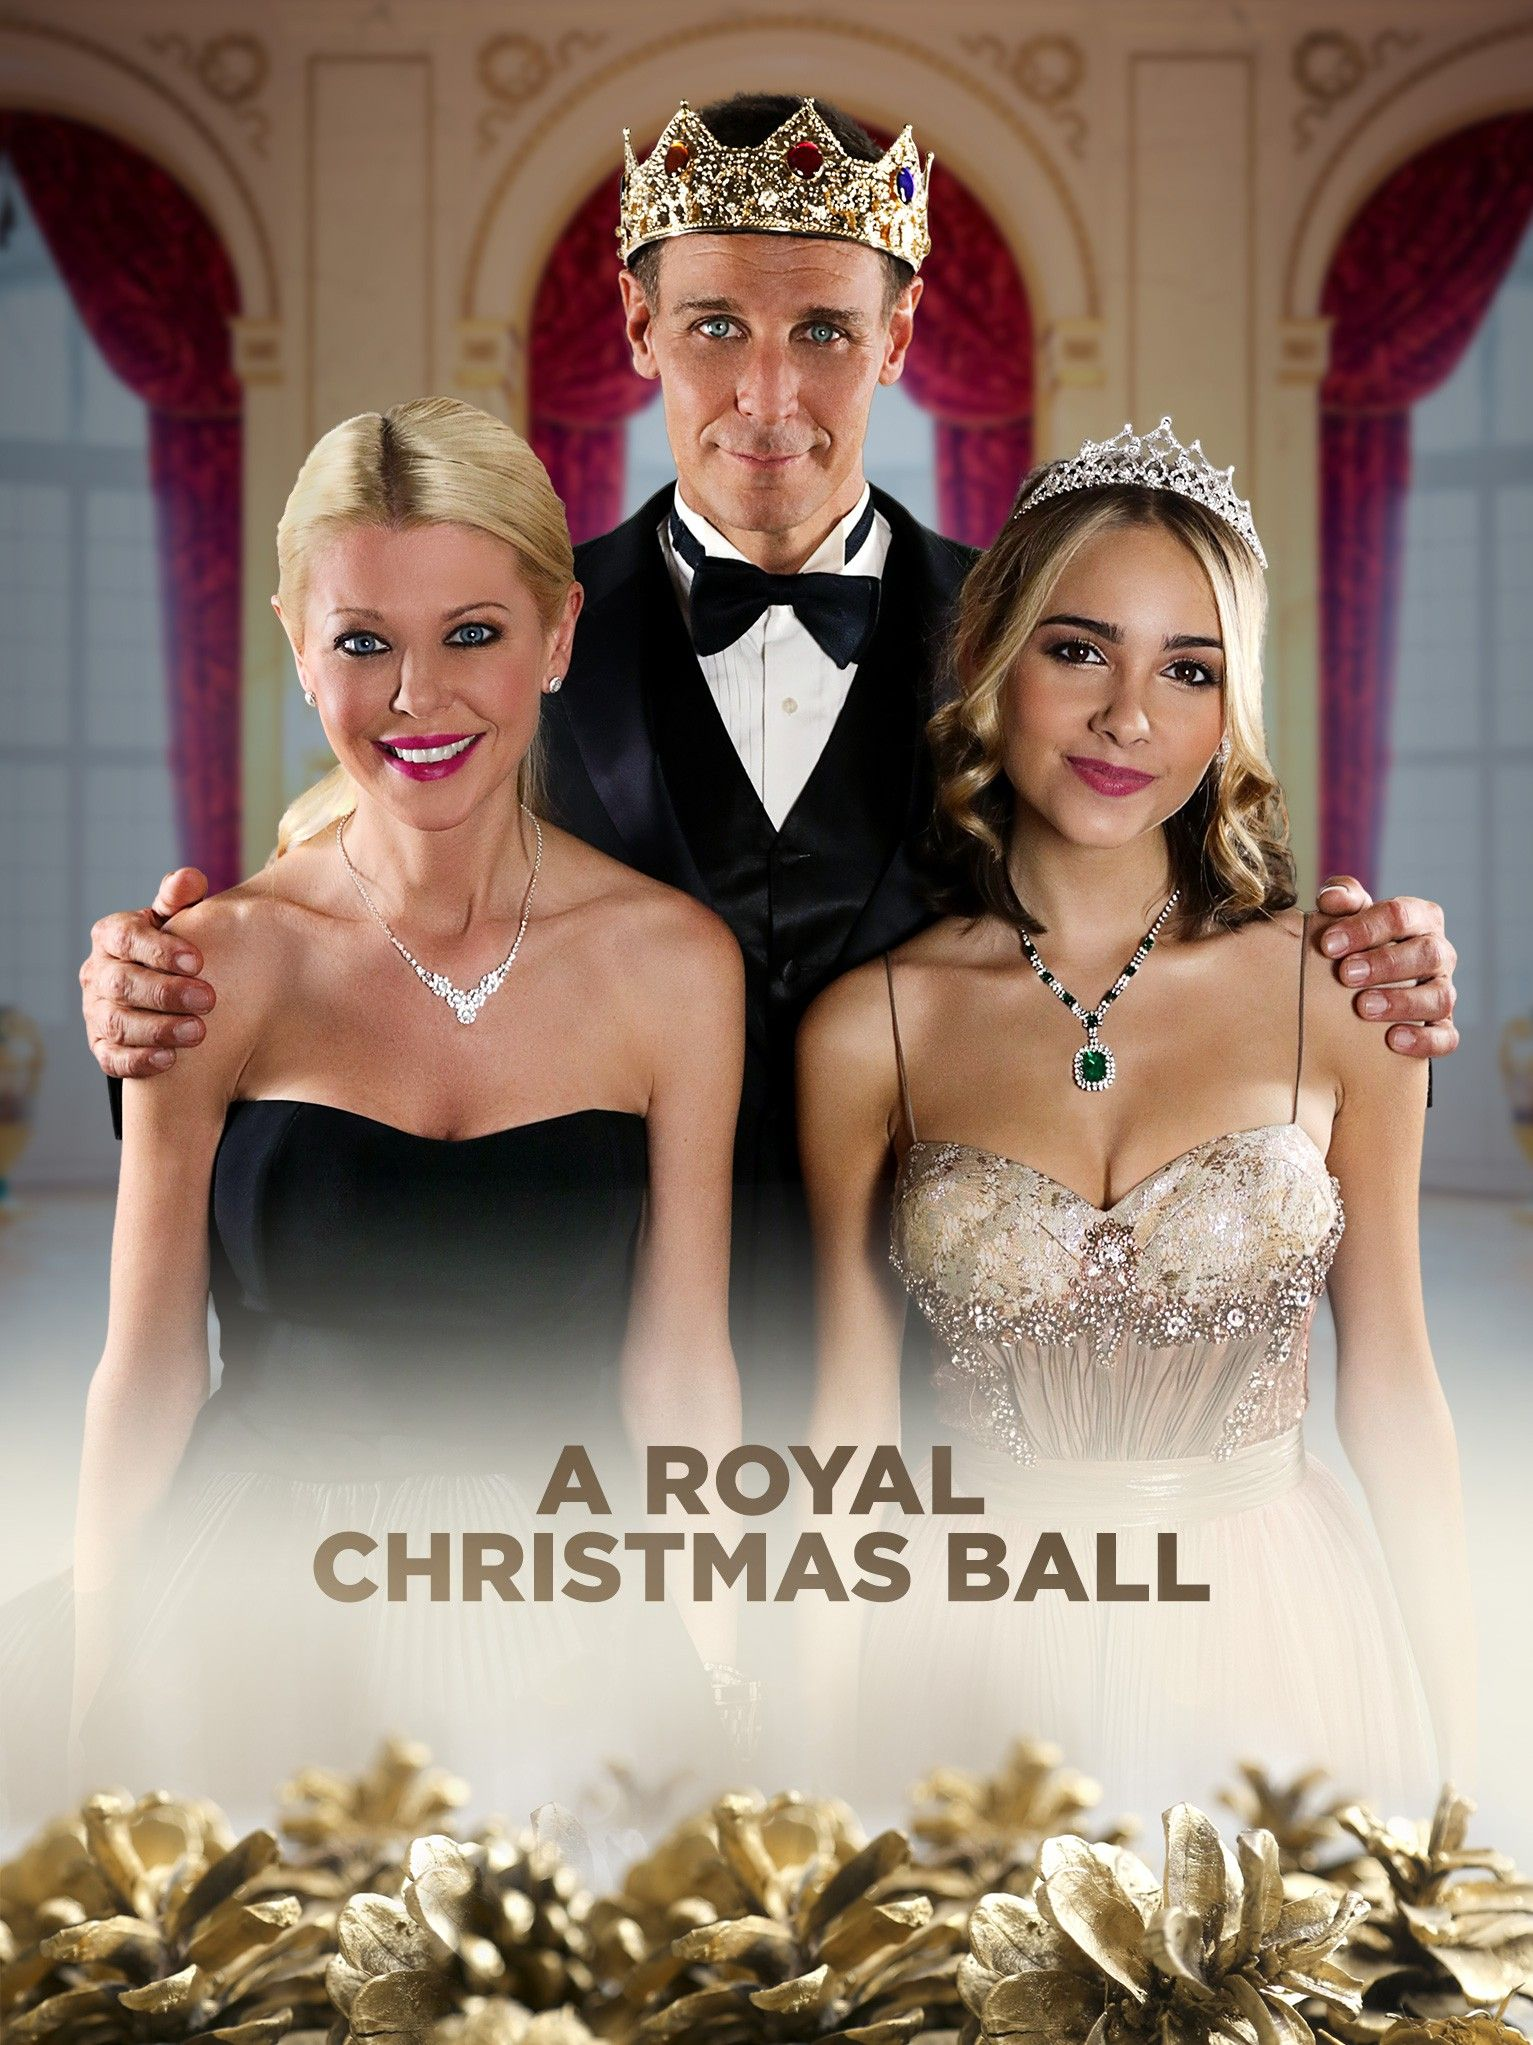 A Royal Christmas.A Royal Christmas Ball 2017 Books Movies Series In 2019